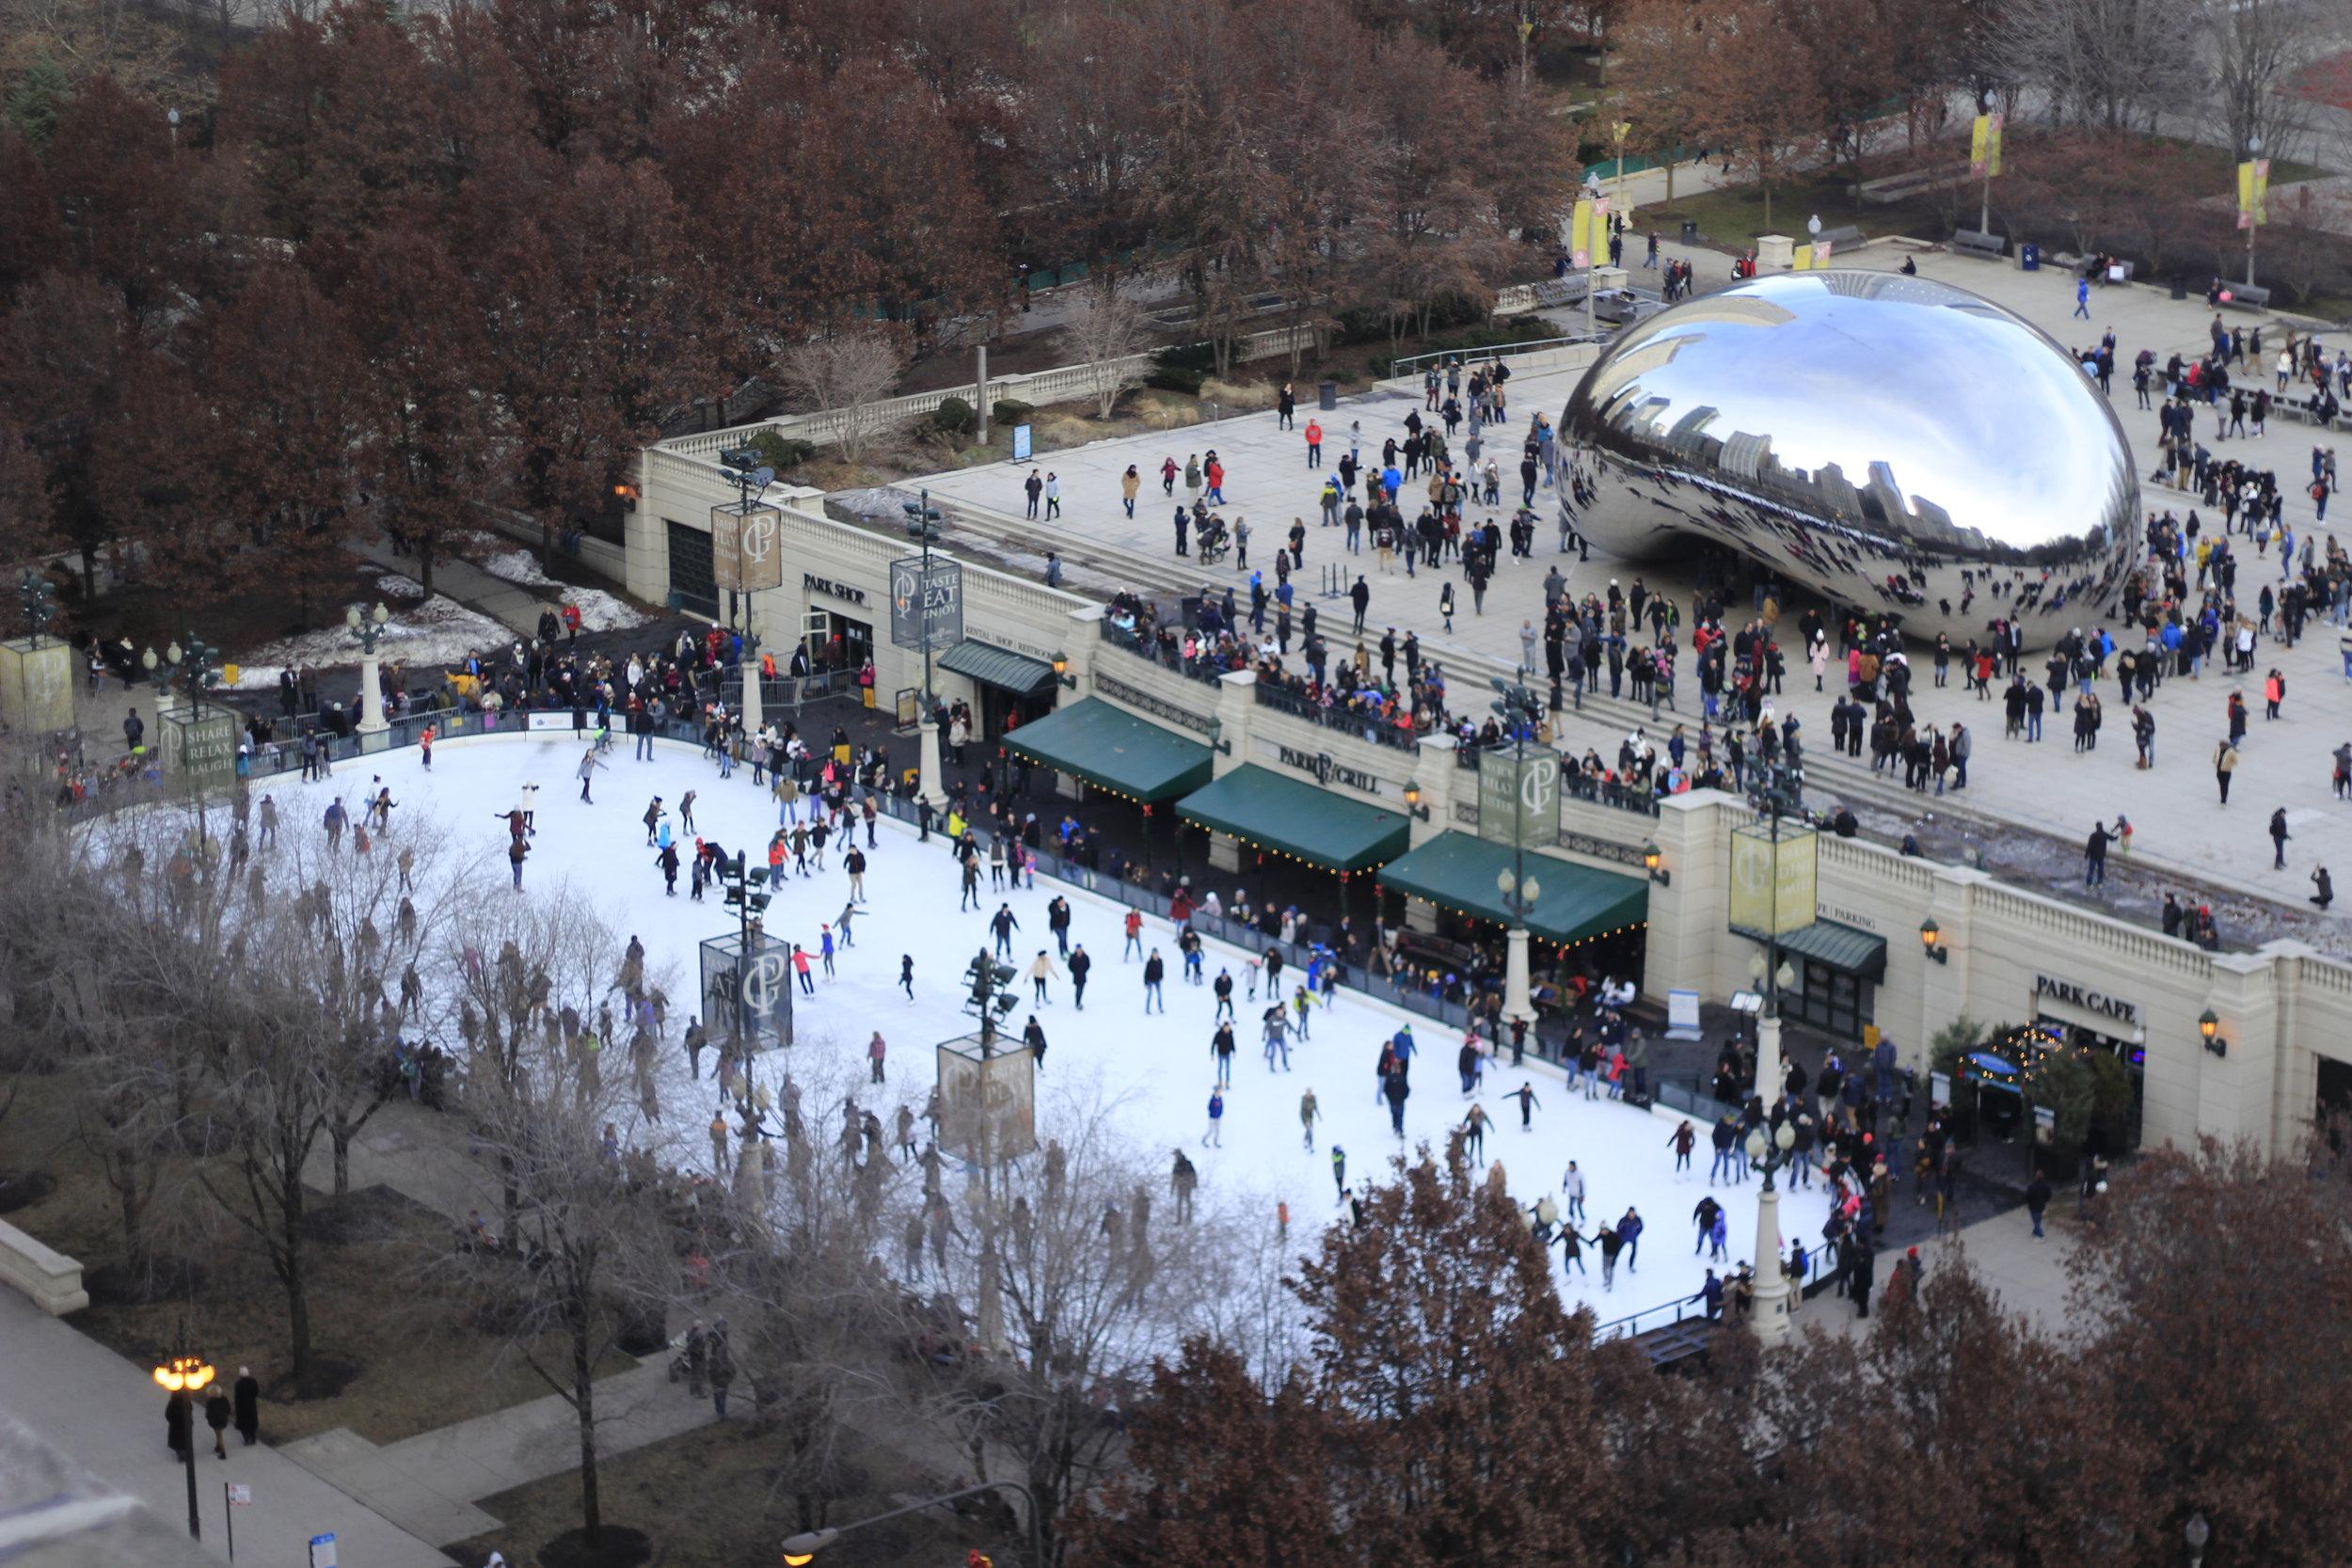 Chicago in December